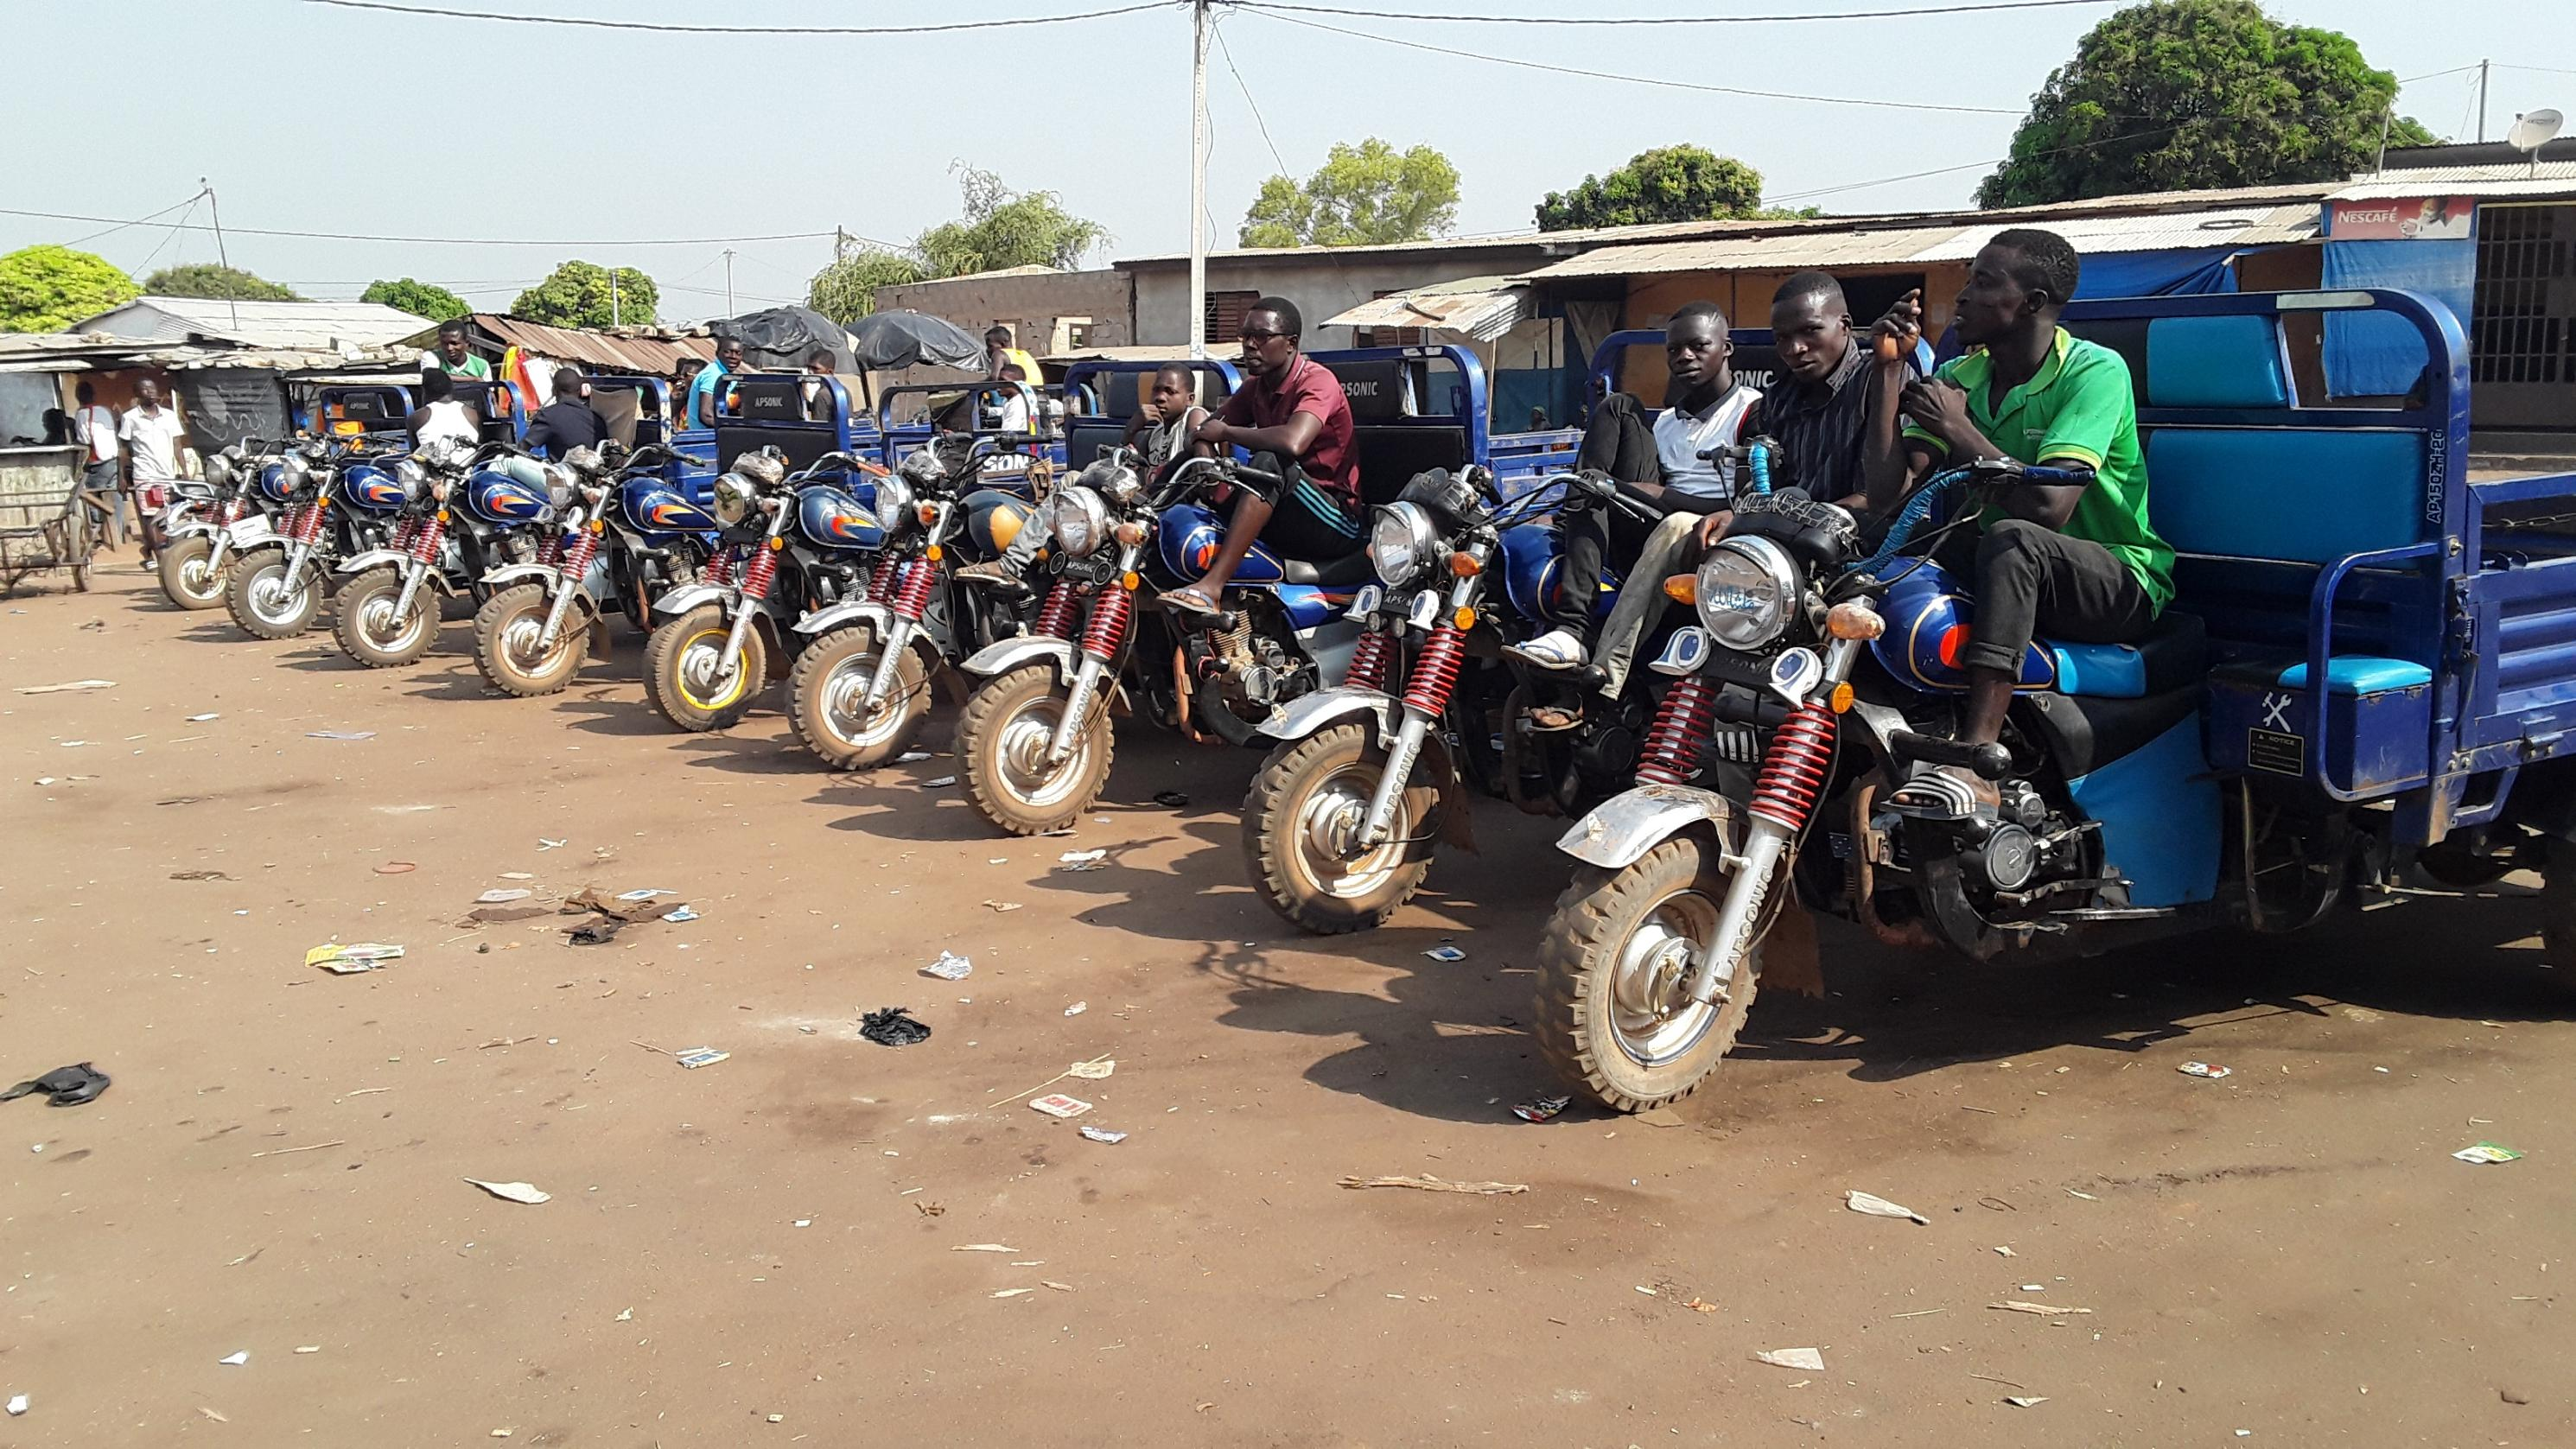 les-mineurs-interdits-de-conduire-motos-et-tricycles-a-bouna